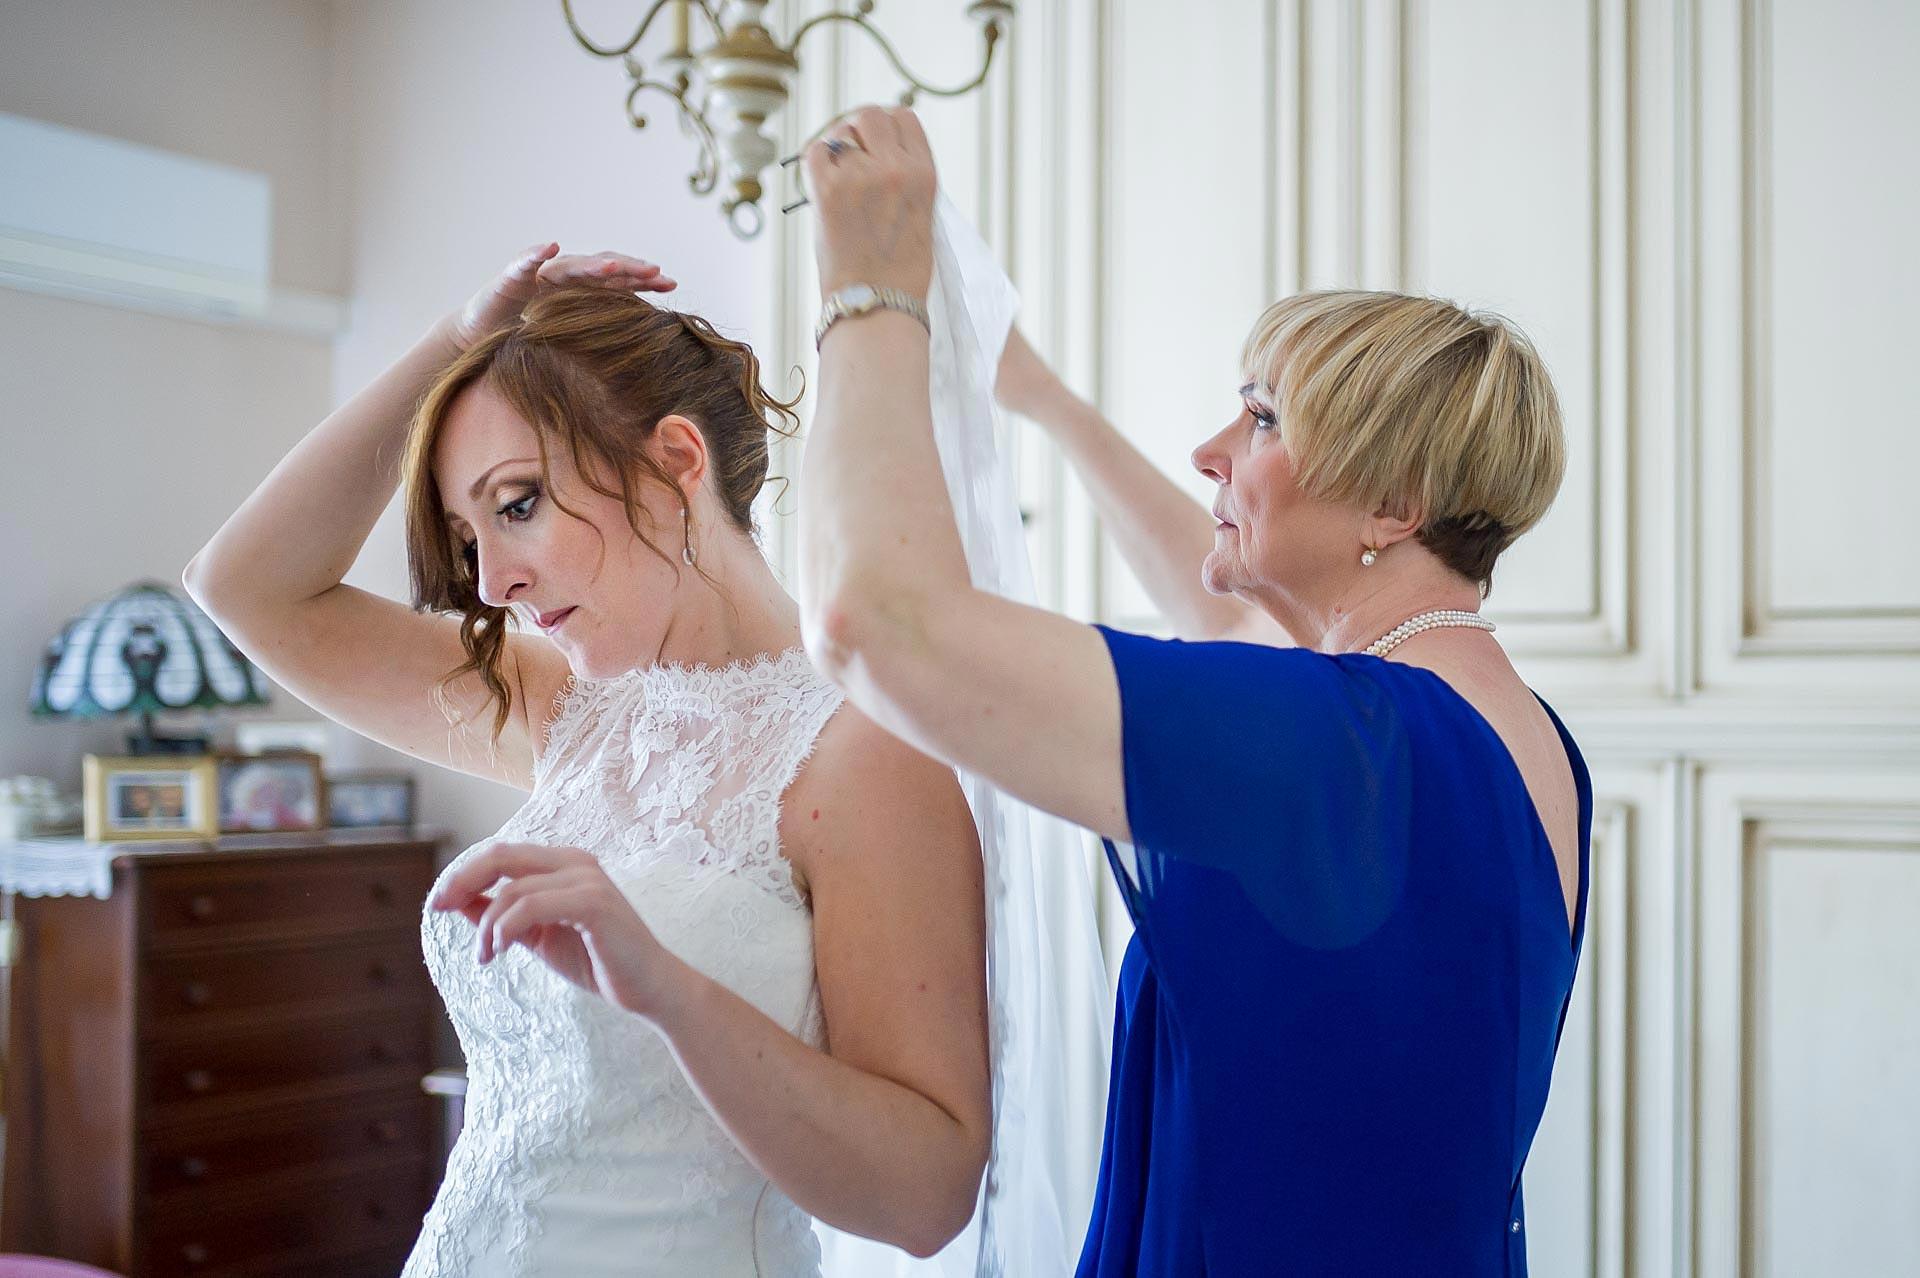 foto-preparativi-sposa-matrimonio-roma-23